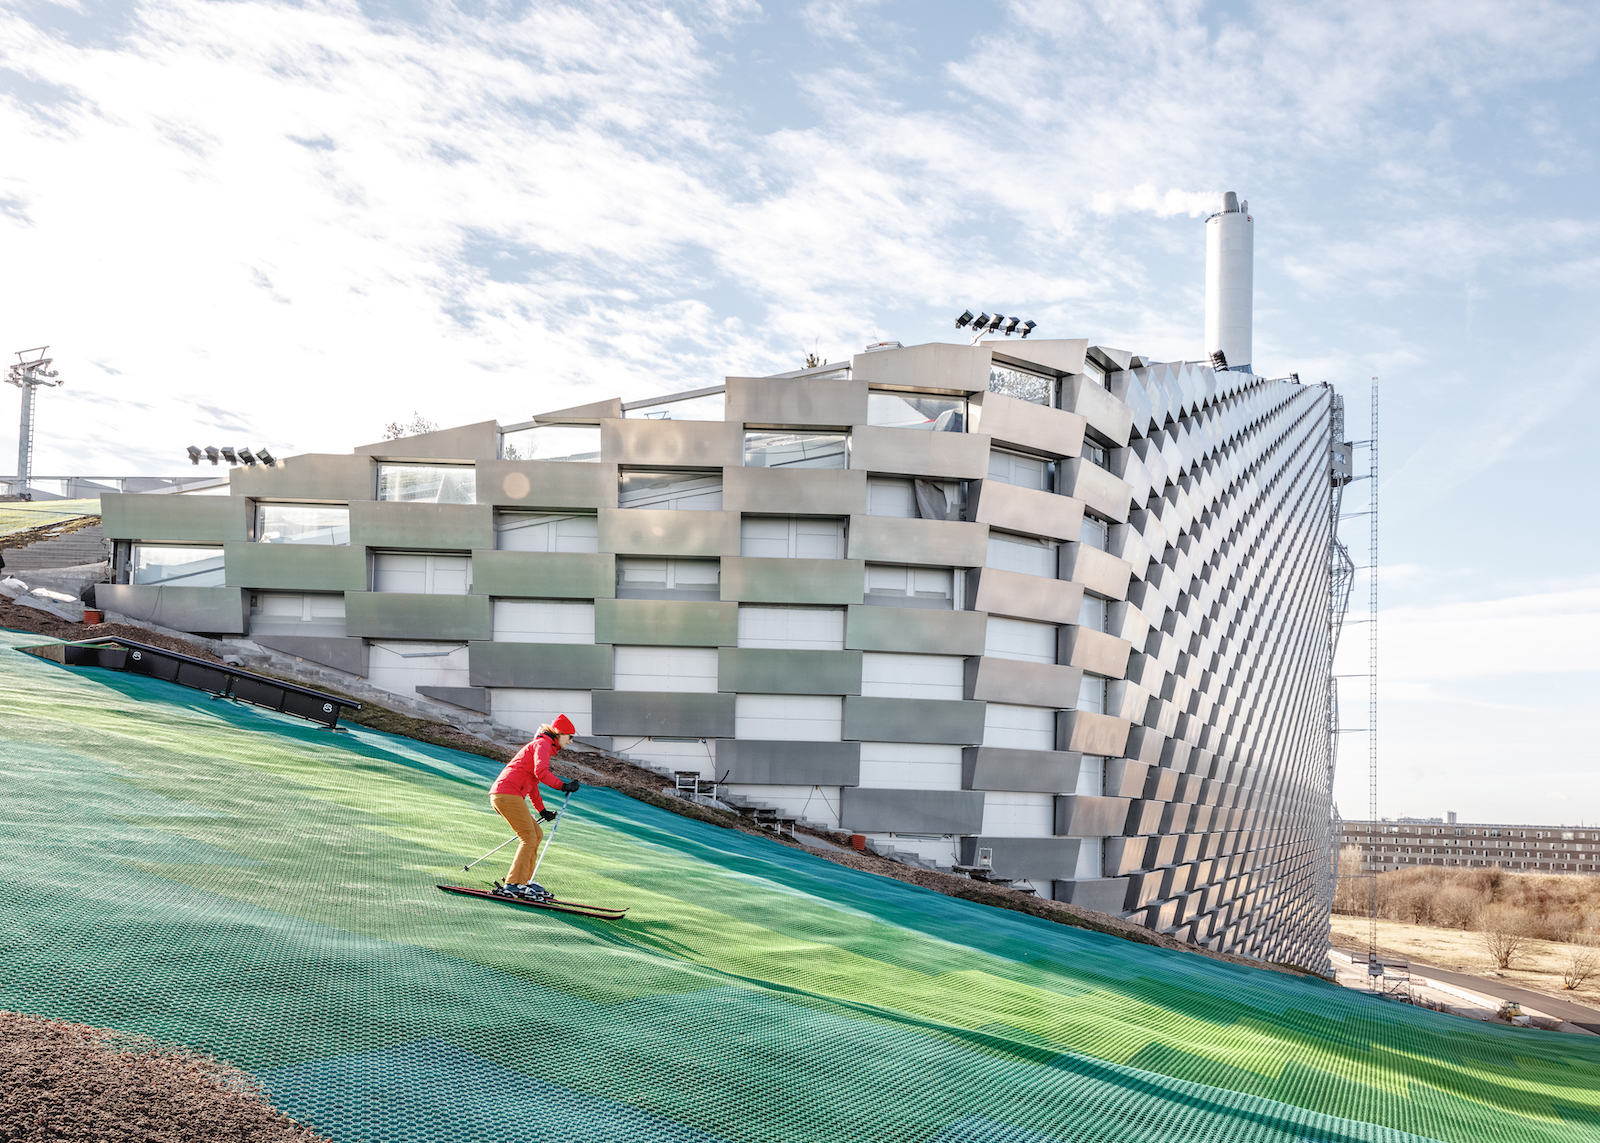 Bjarke Ingels Group's ski slope power plant is finally open